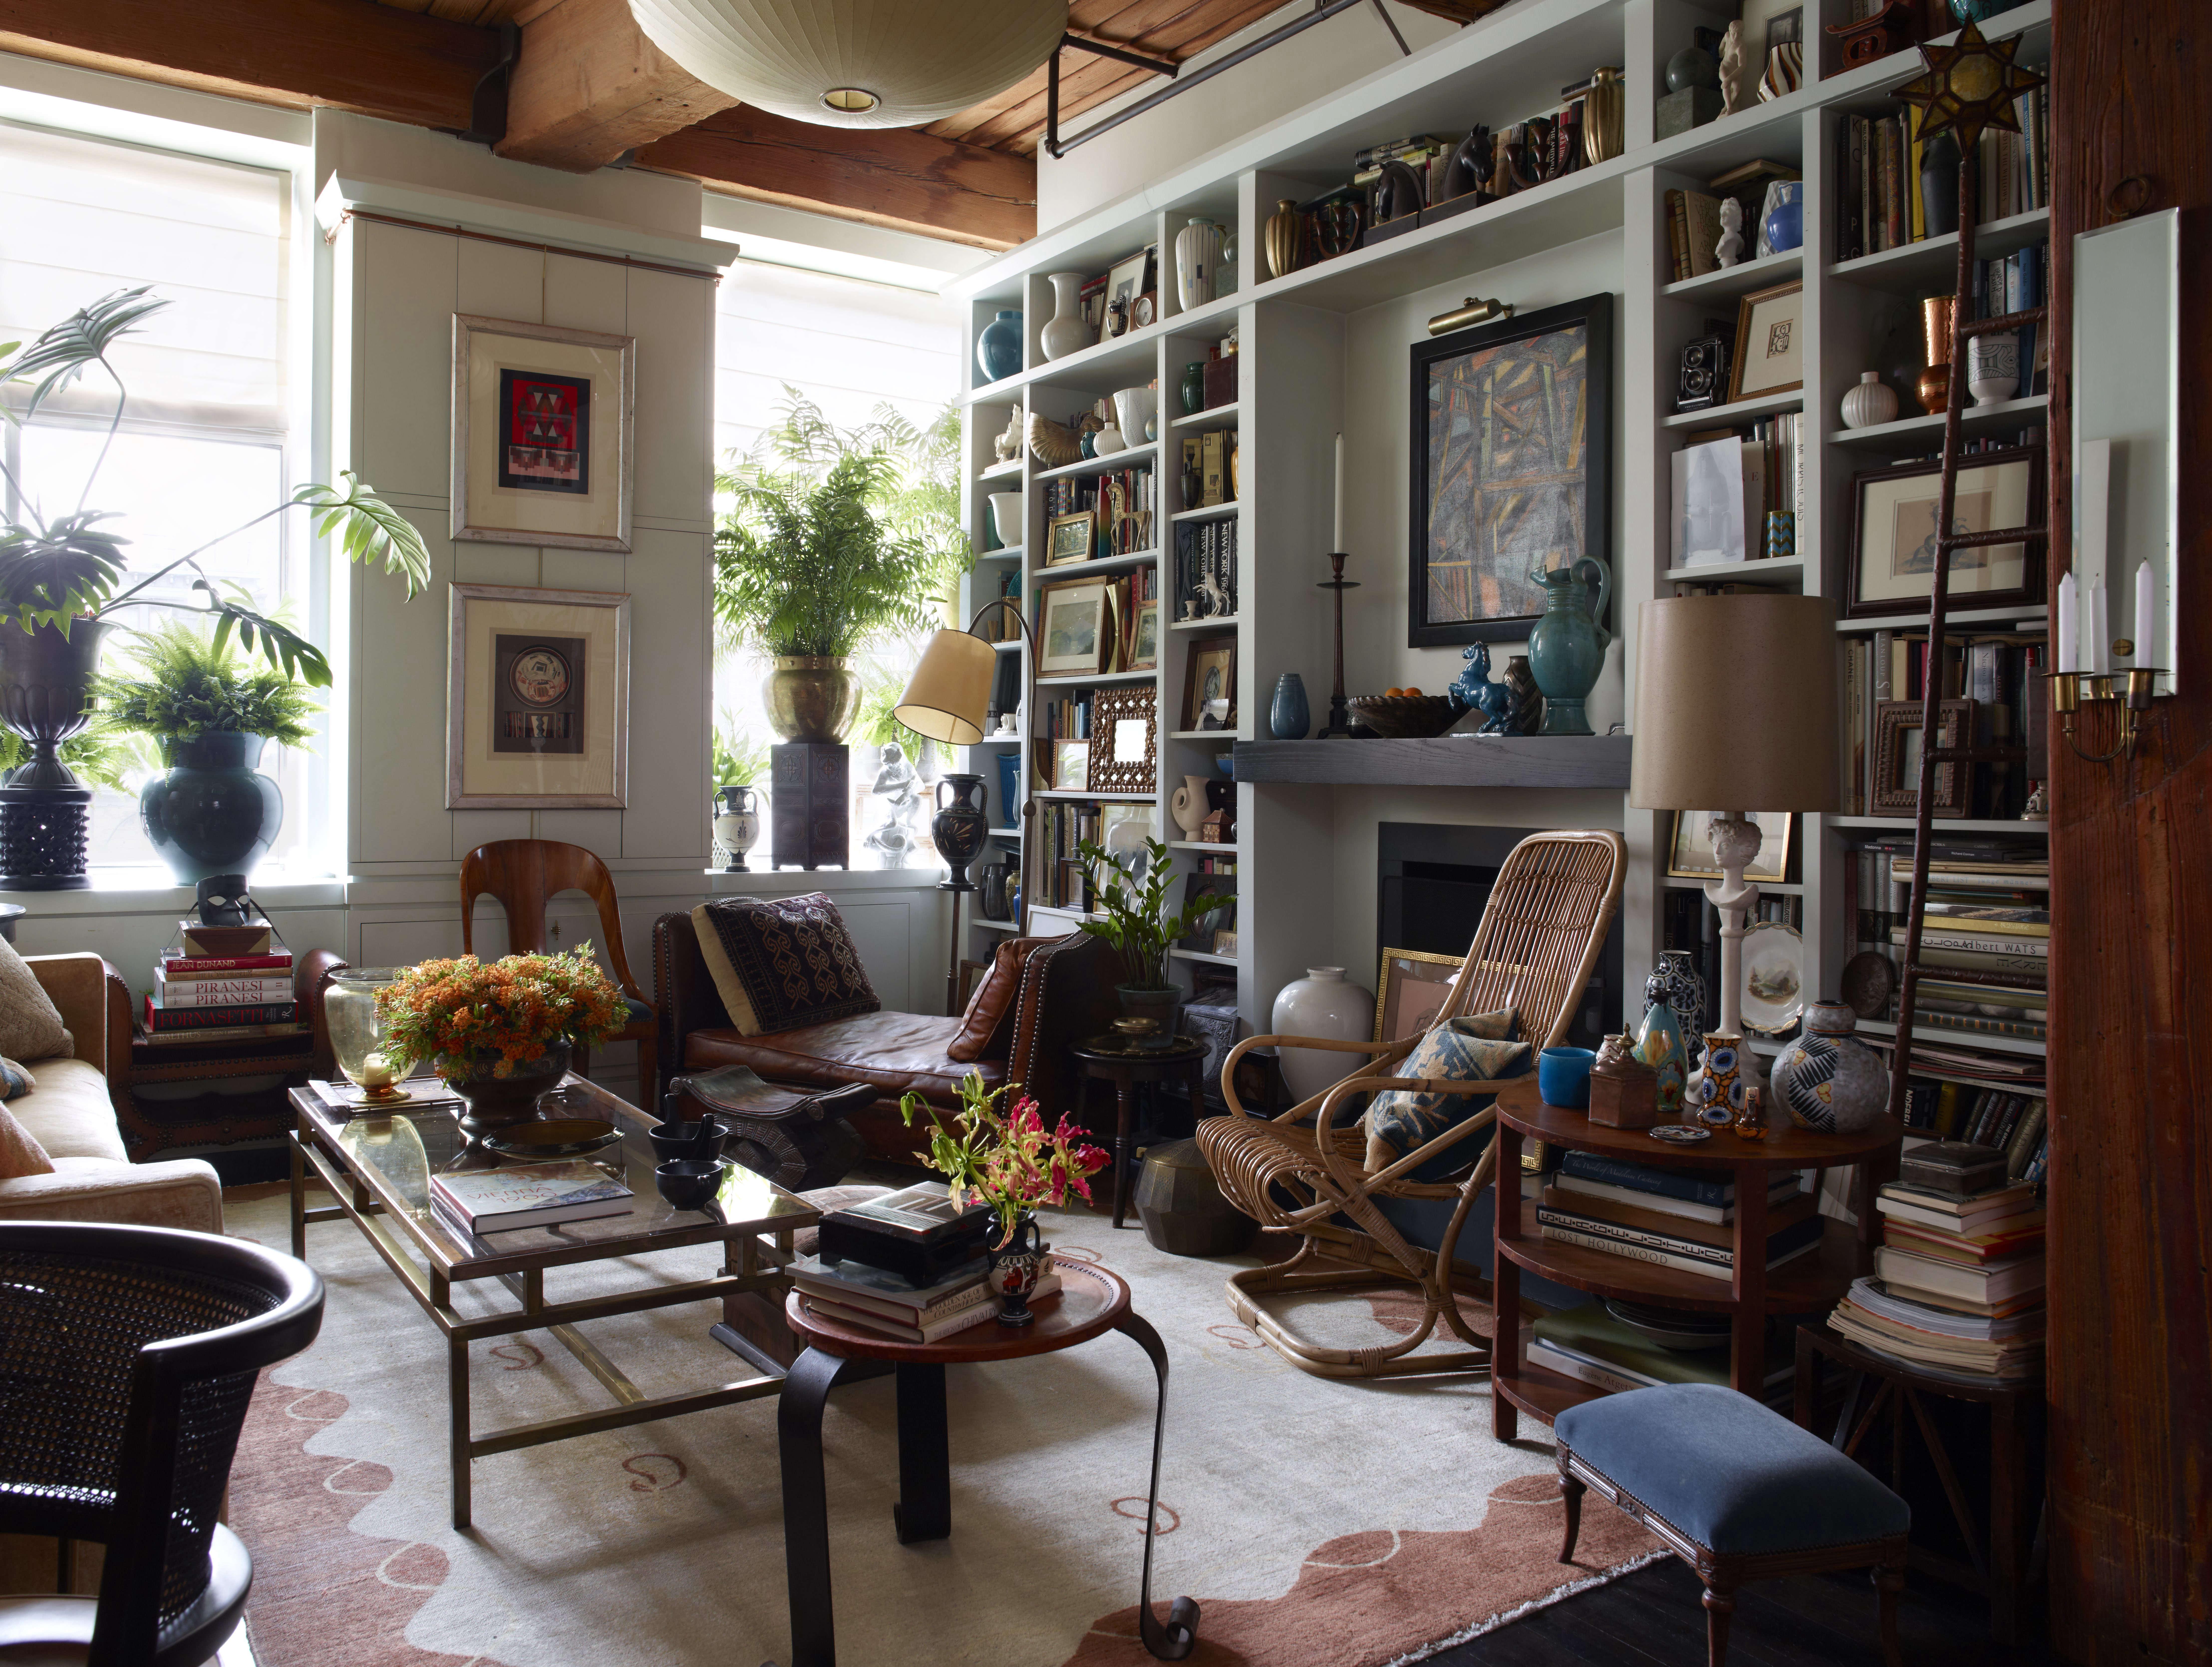 eclectic living room bookshelves artwork busy interior alexandra loew 13